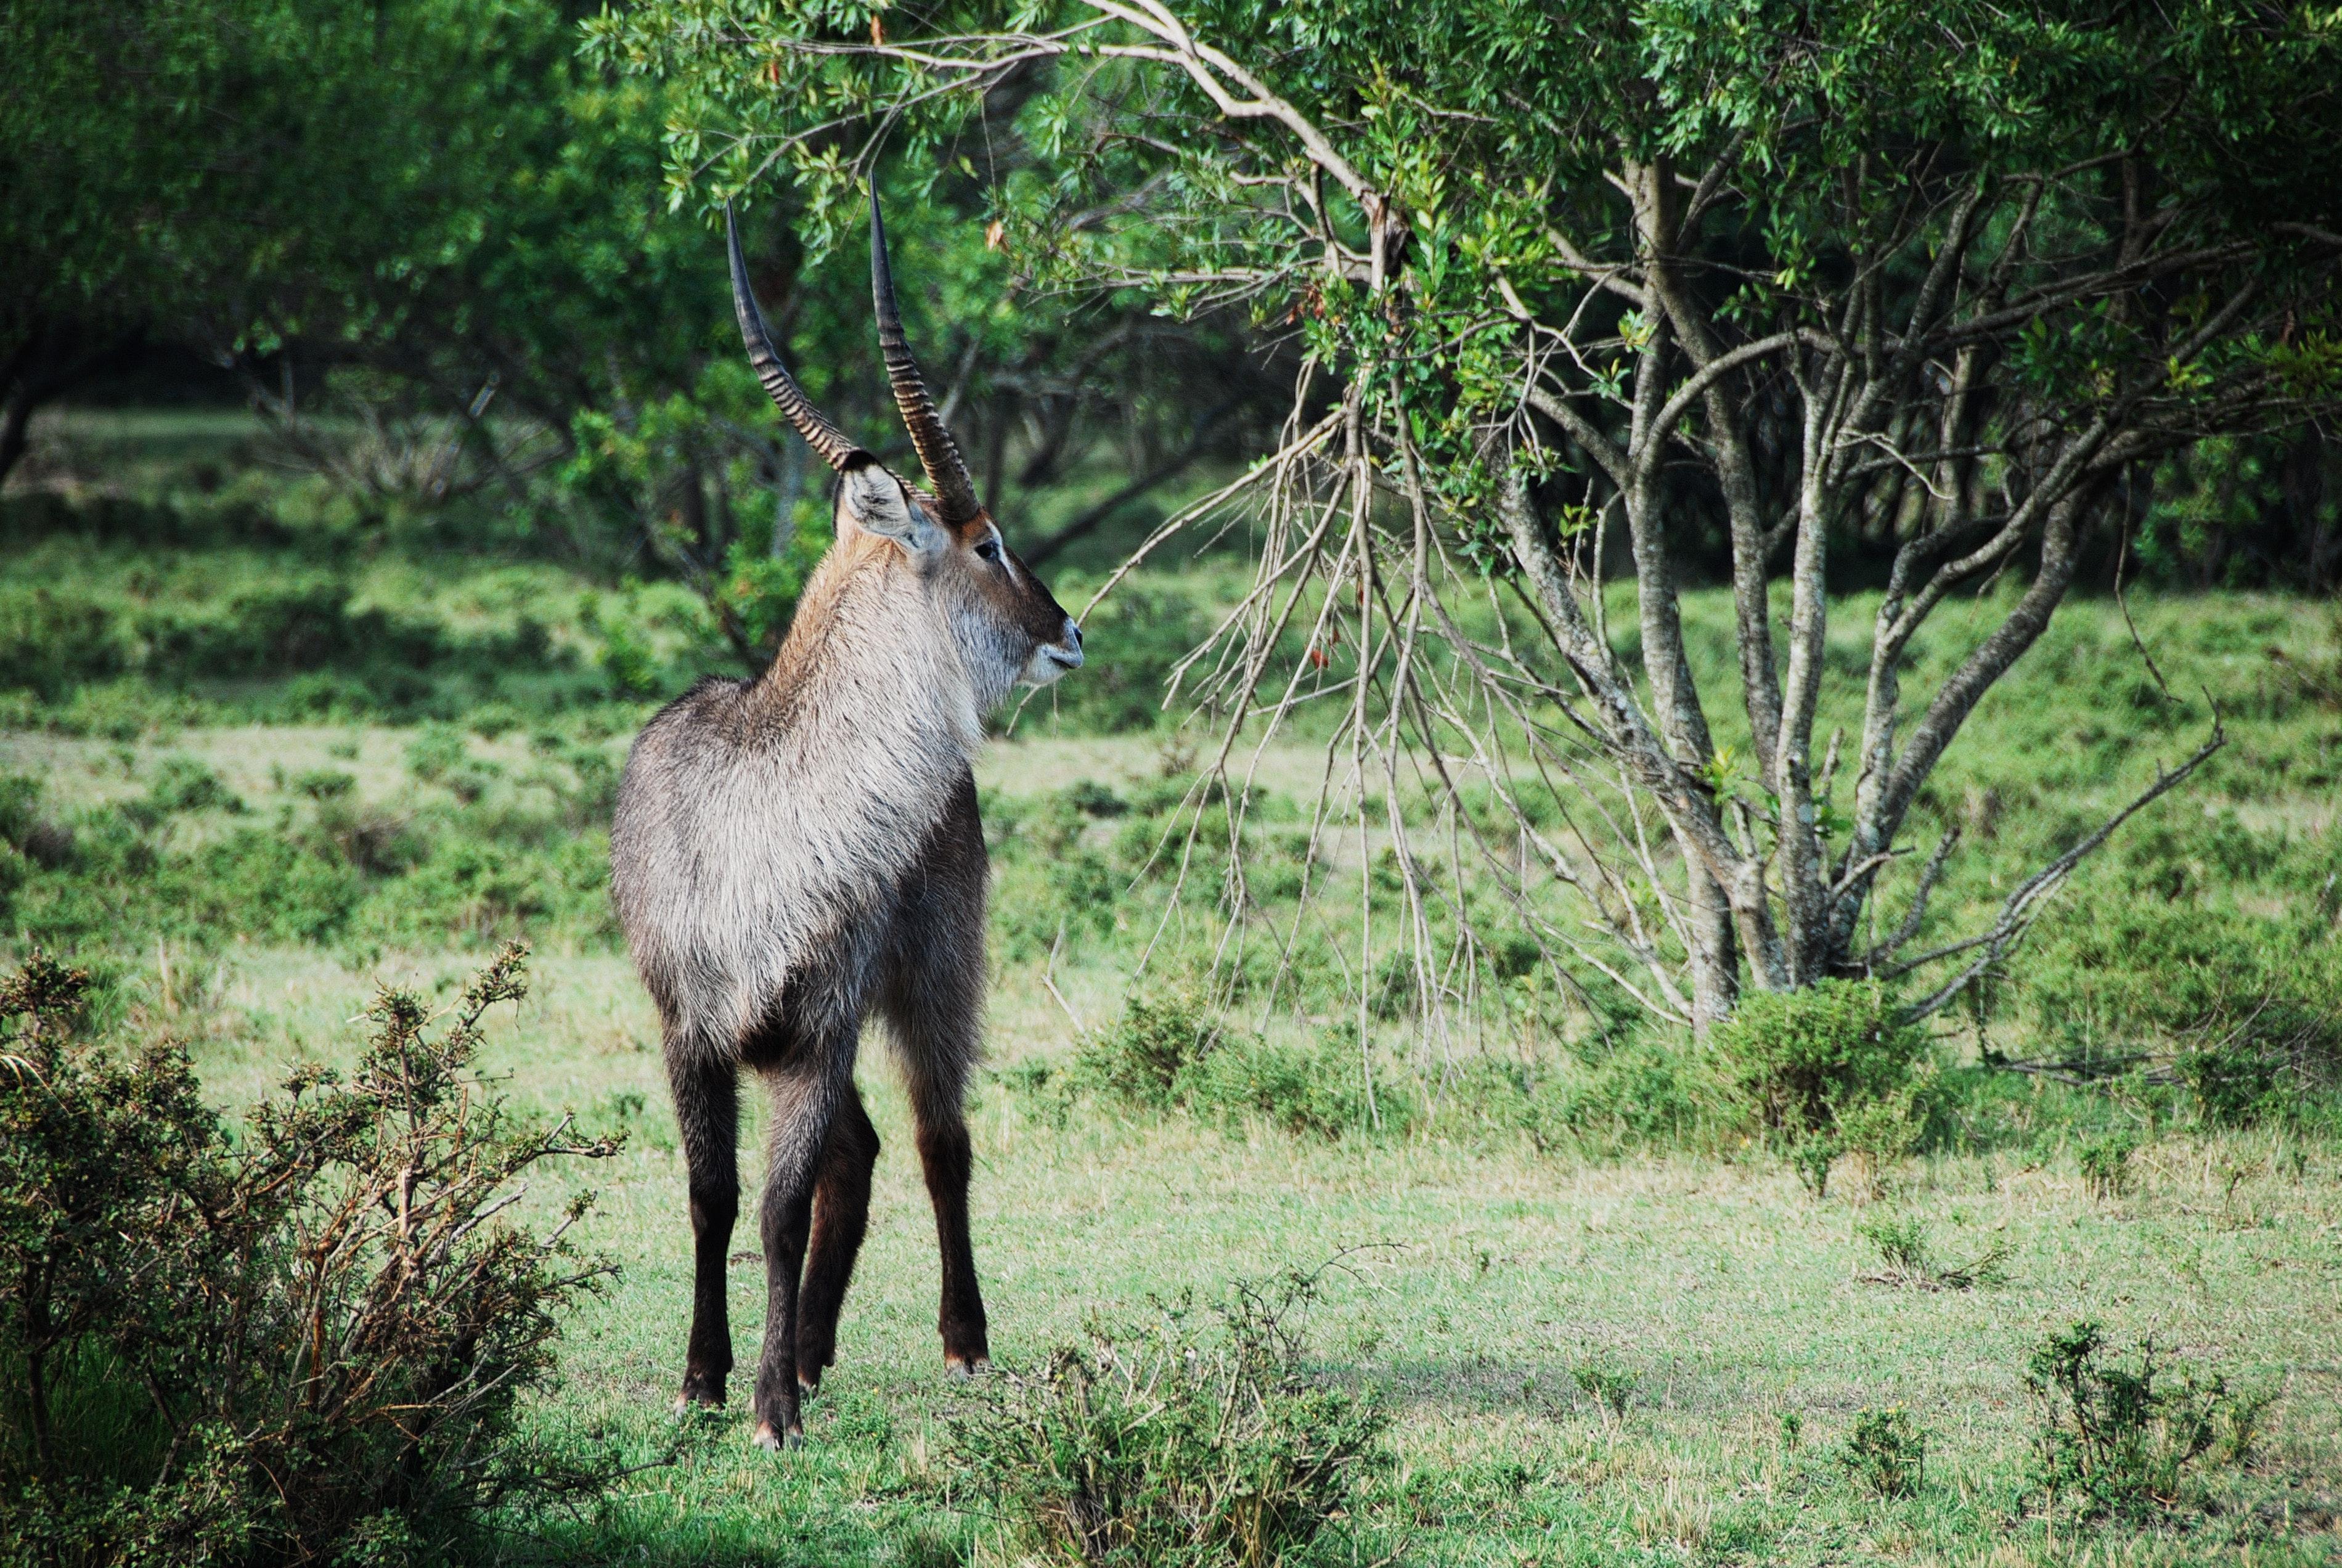 Gray and black long coat antelope on green grass behind green tree photo